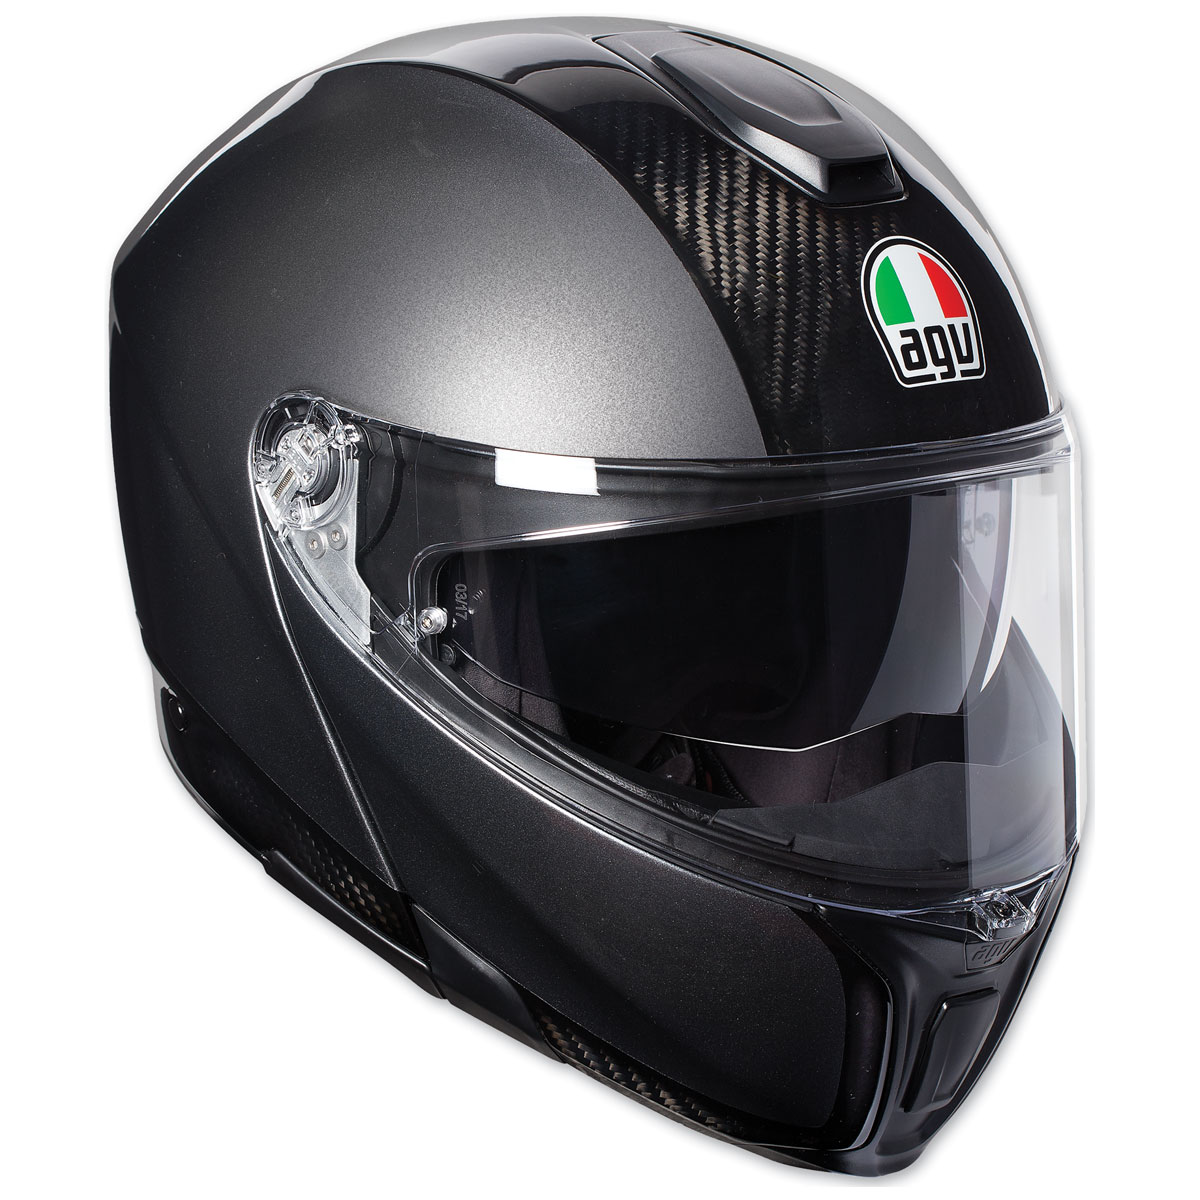 bc933614 AGV Sport Modular Carbon/Dark Gray Helmet - 1201O4IY002XL | JPCycles.com